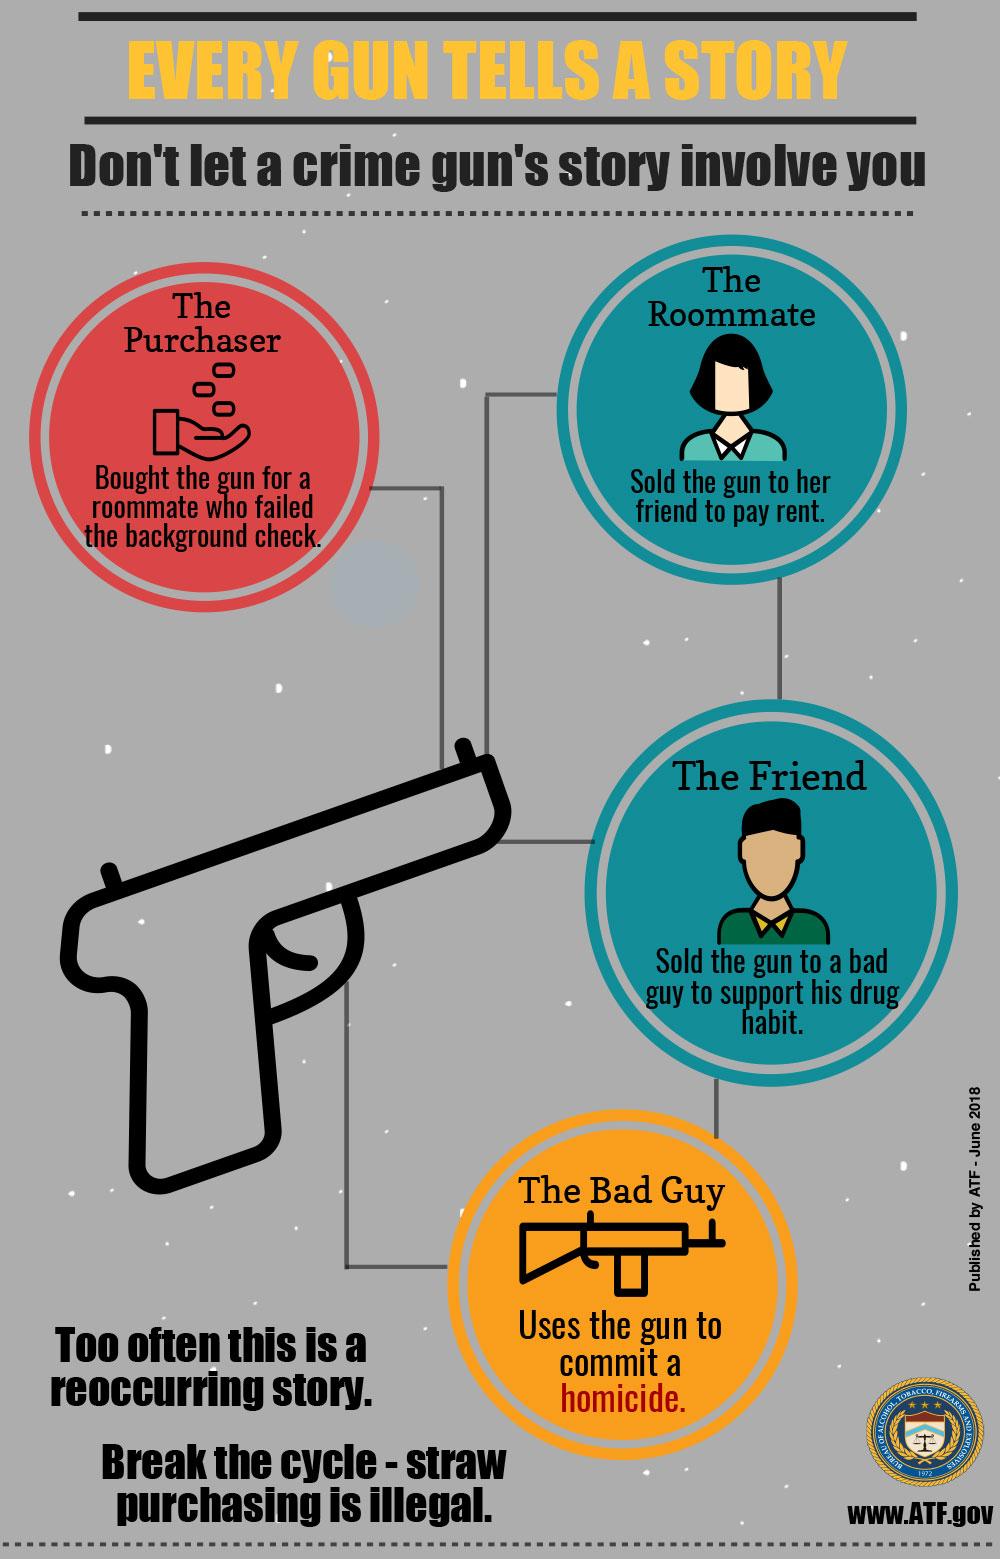 Crime Gun Story: Every Gun Tells a Story